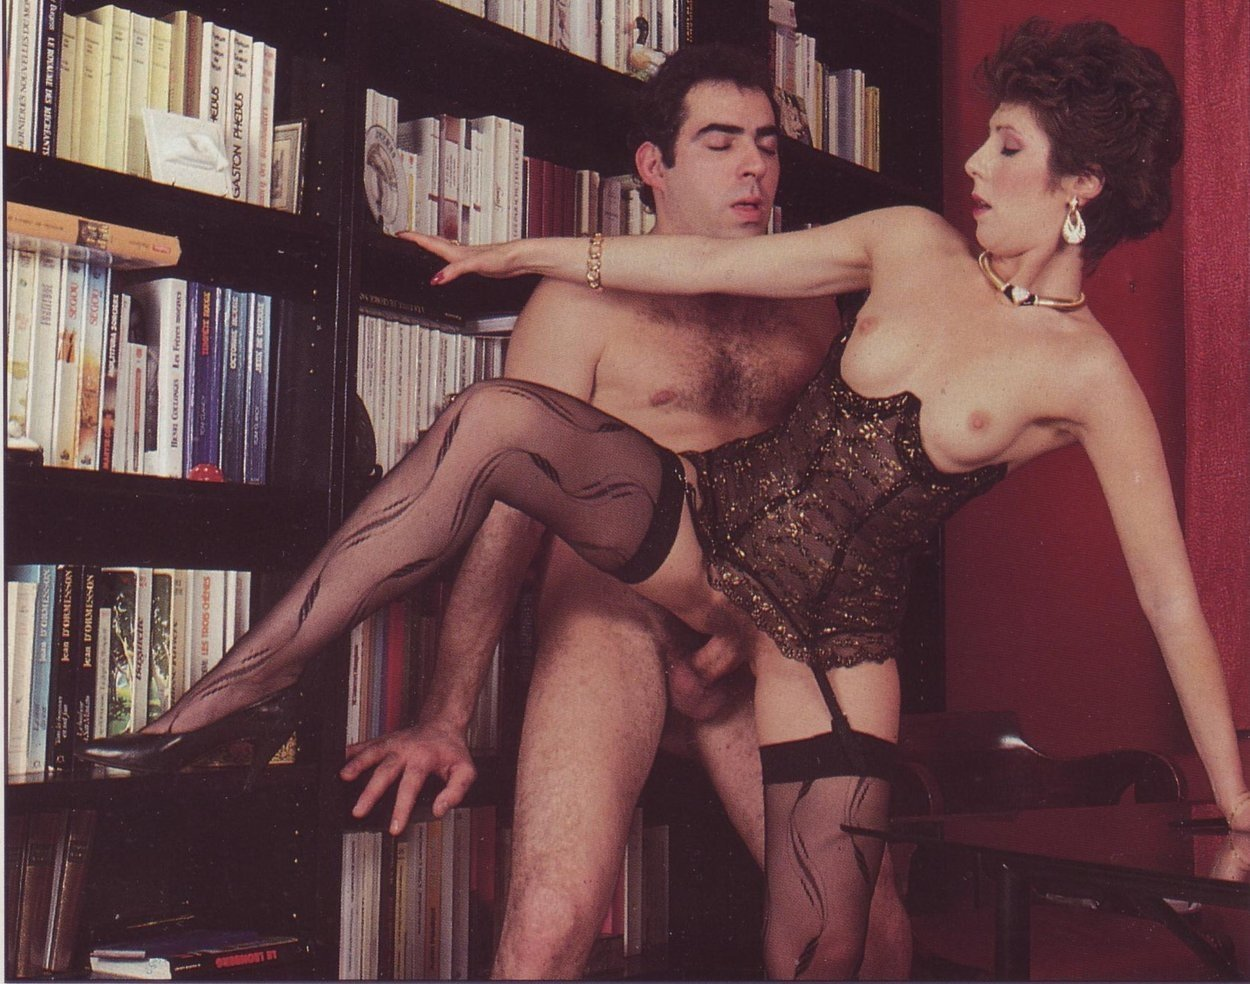 Ретро порно в чулках онлайн, Порно чулки ретро - 28 видео. Смотреть порно онлайн 12 фотография